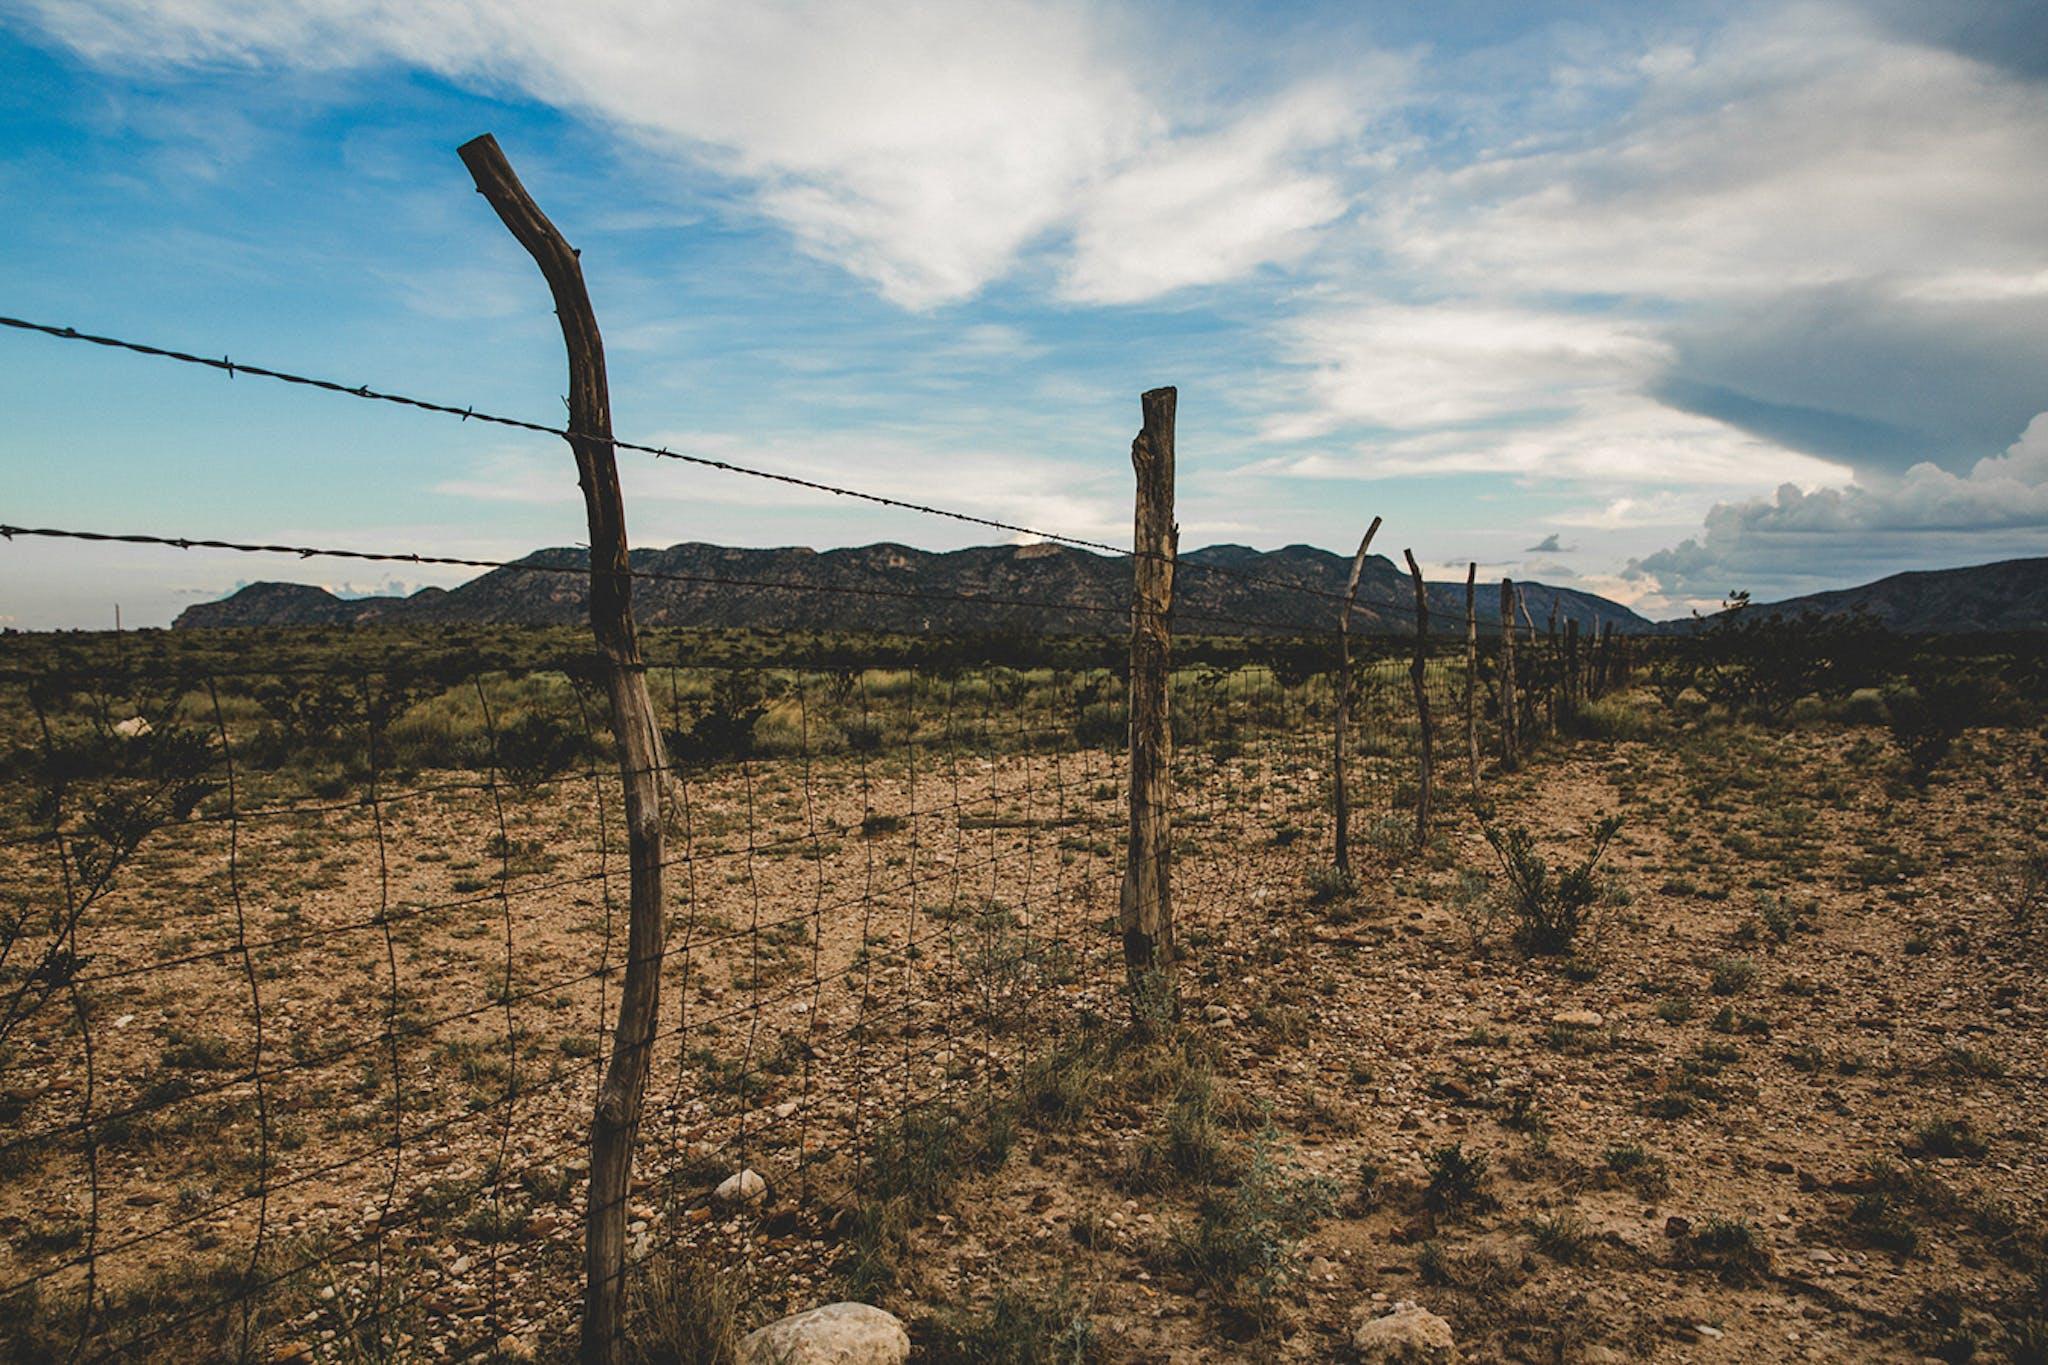 Explore Ranches Maravillas Ranch